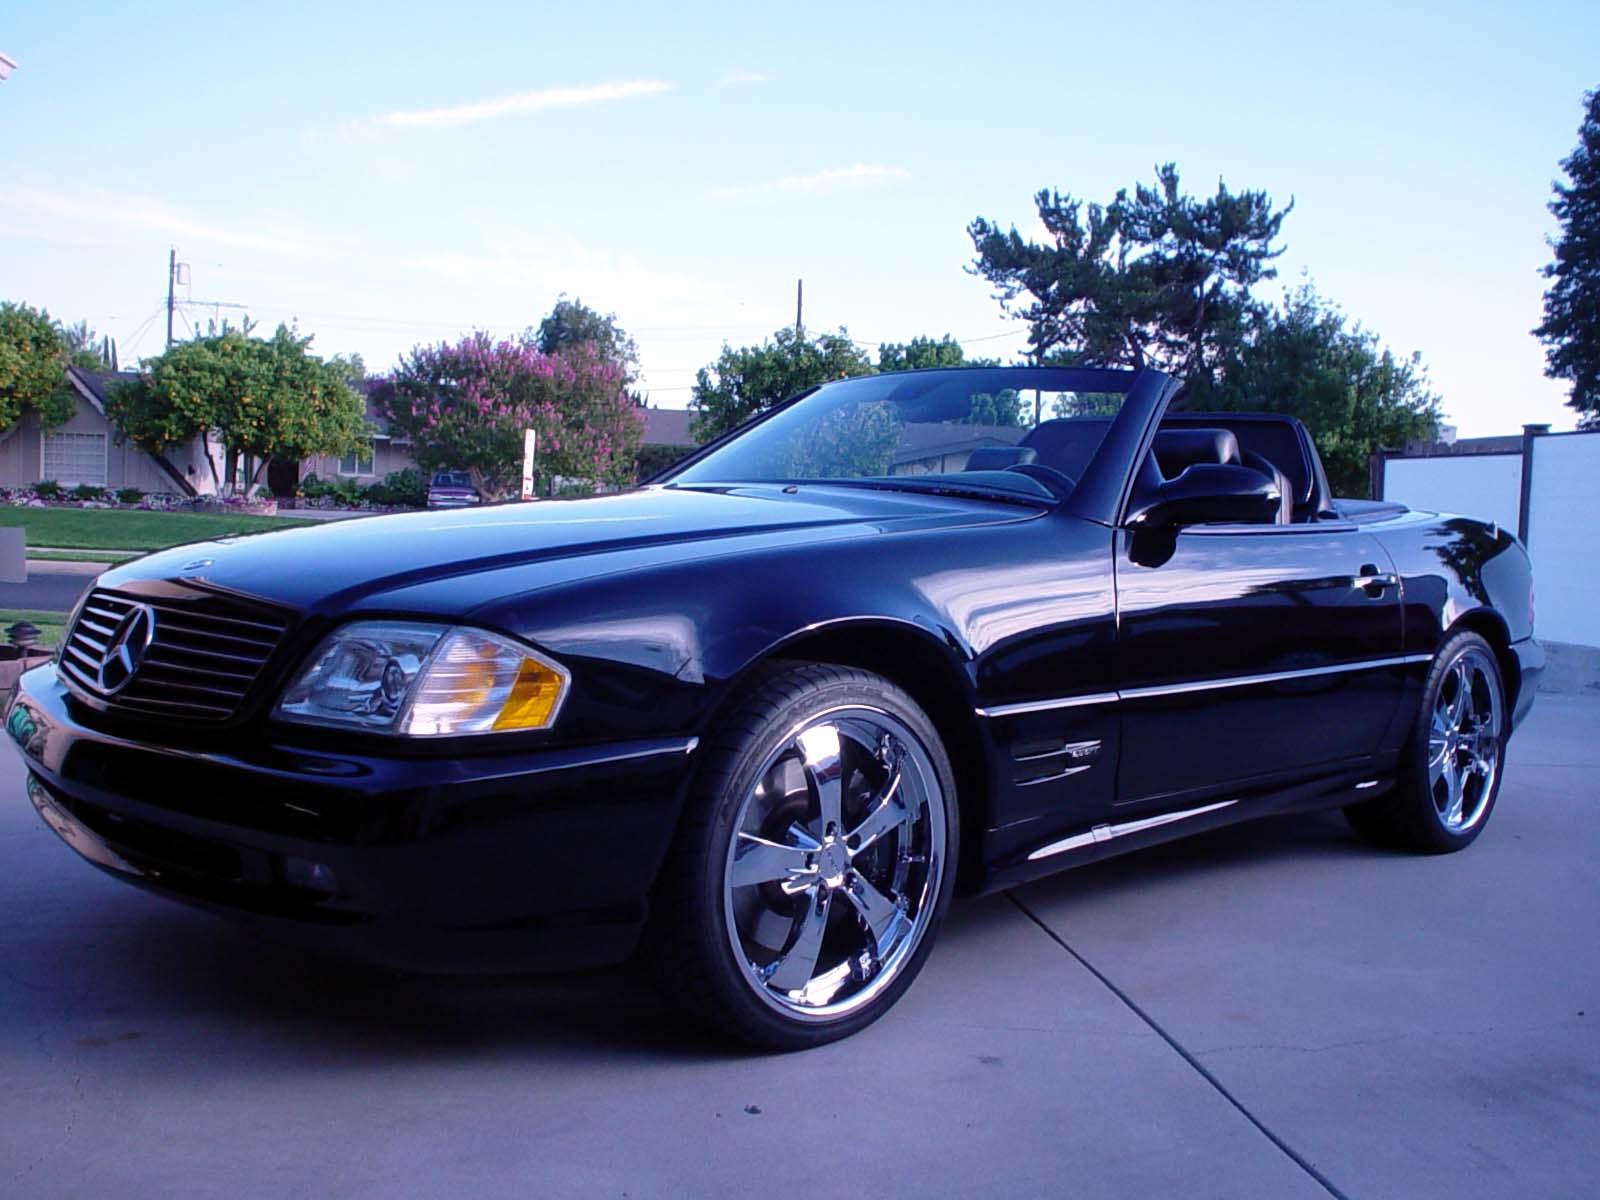 2000 MercedesBenz